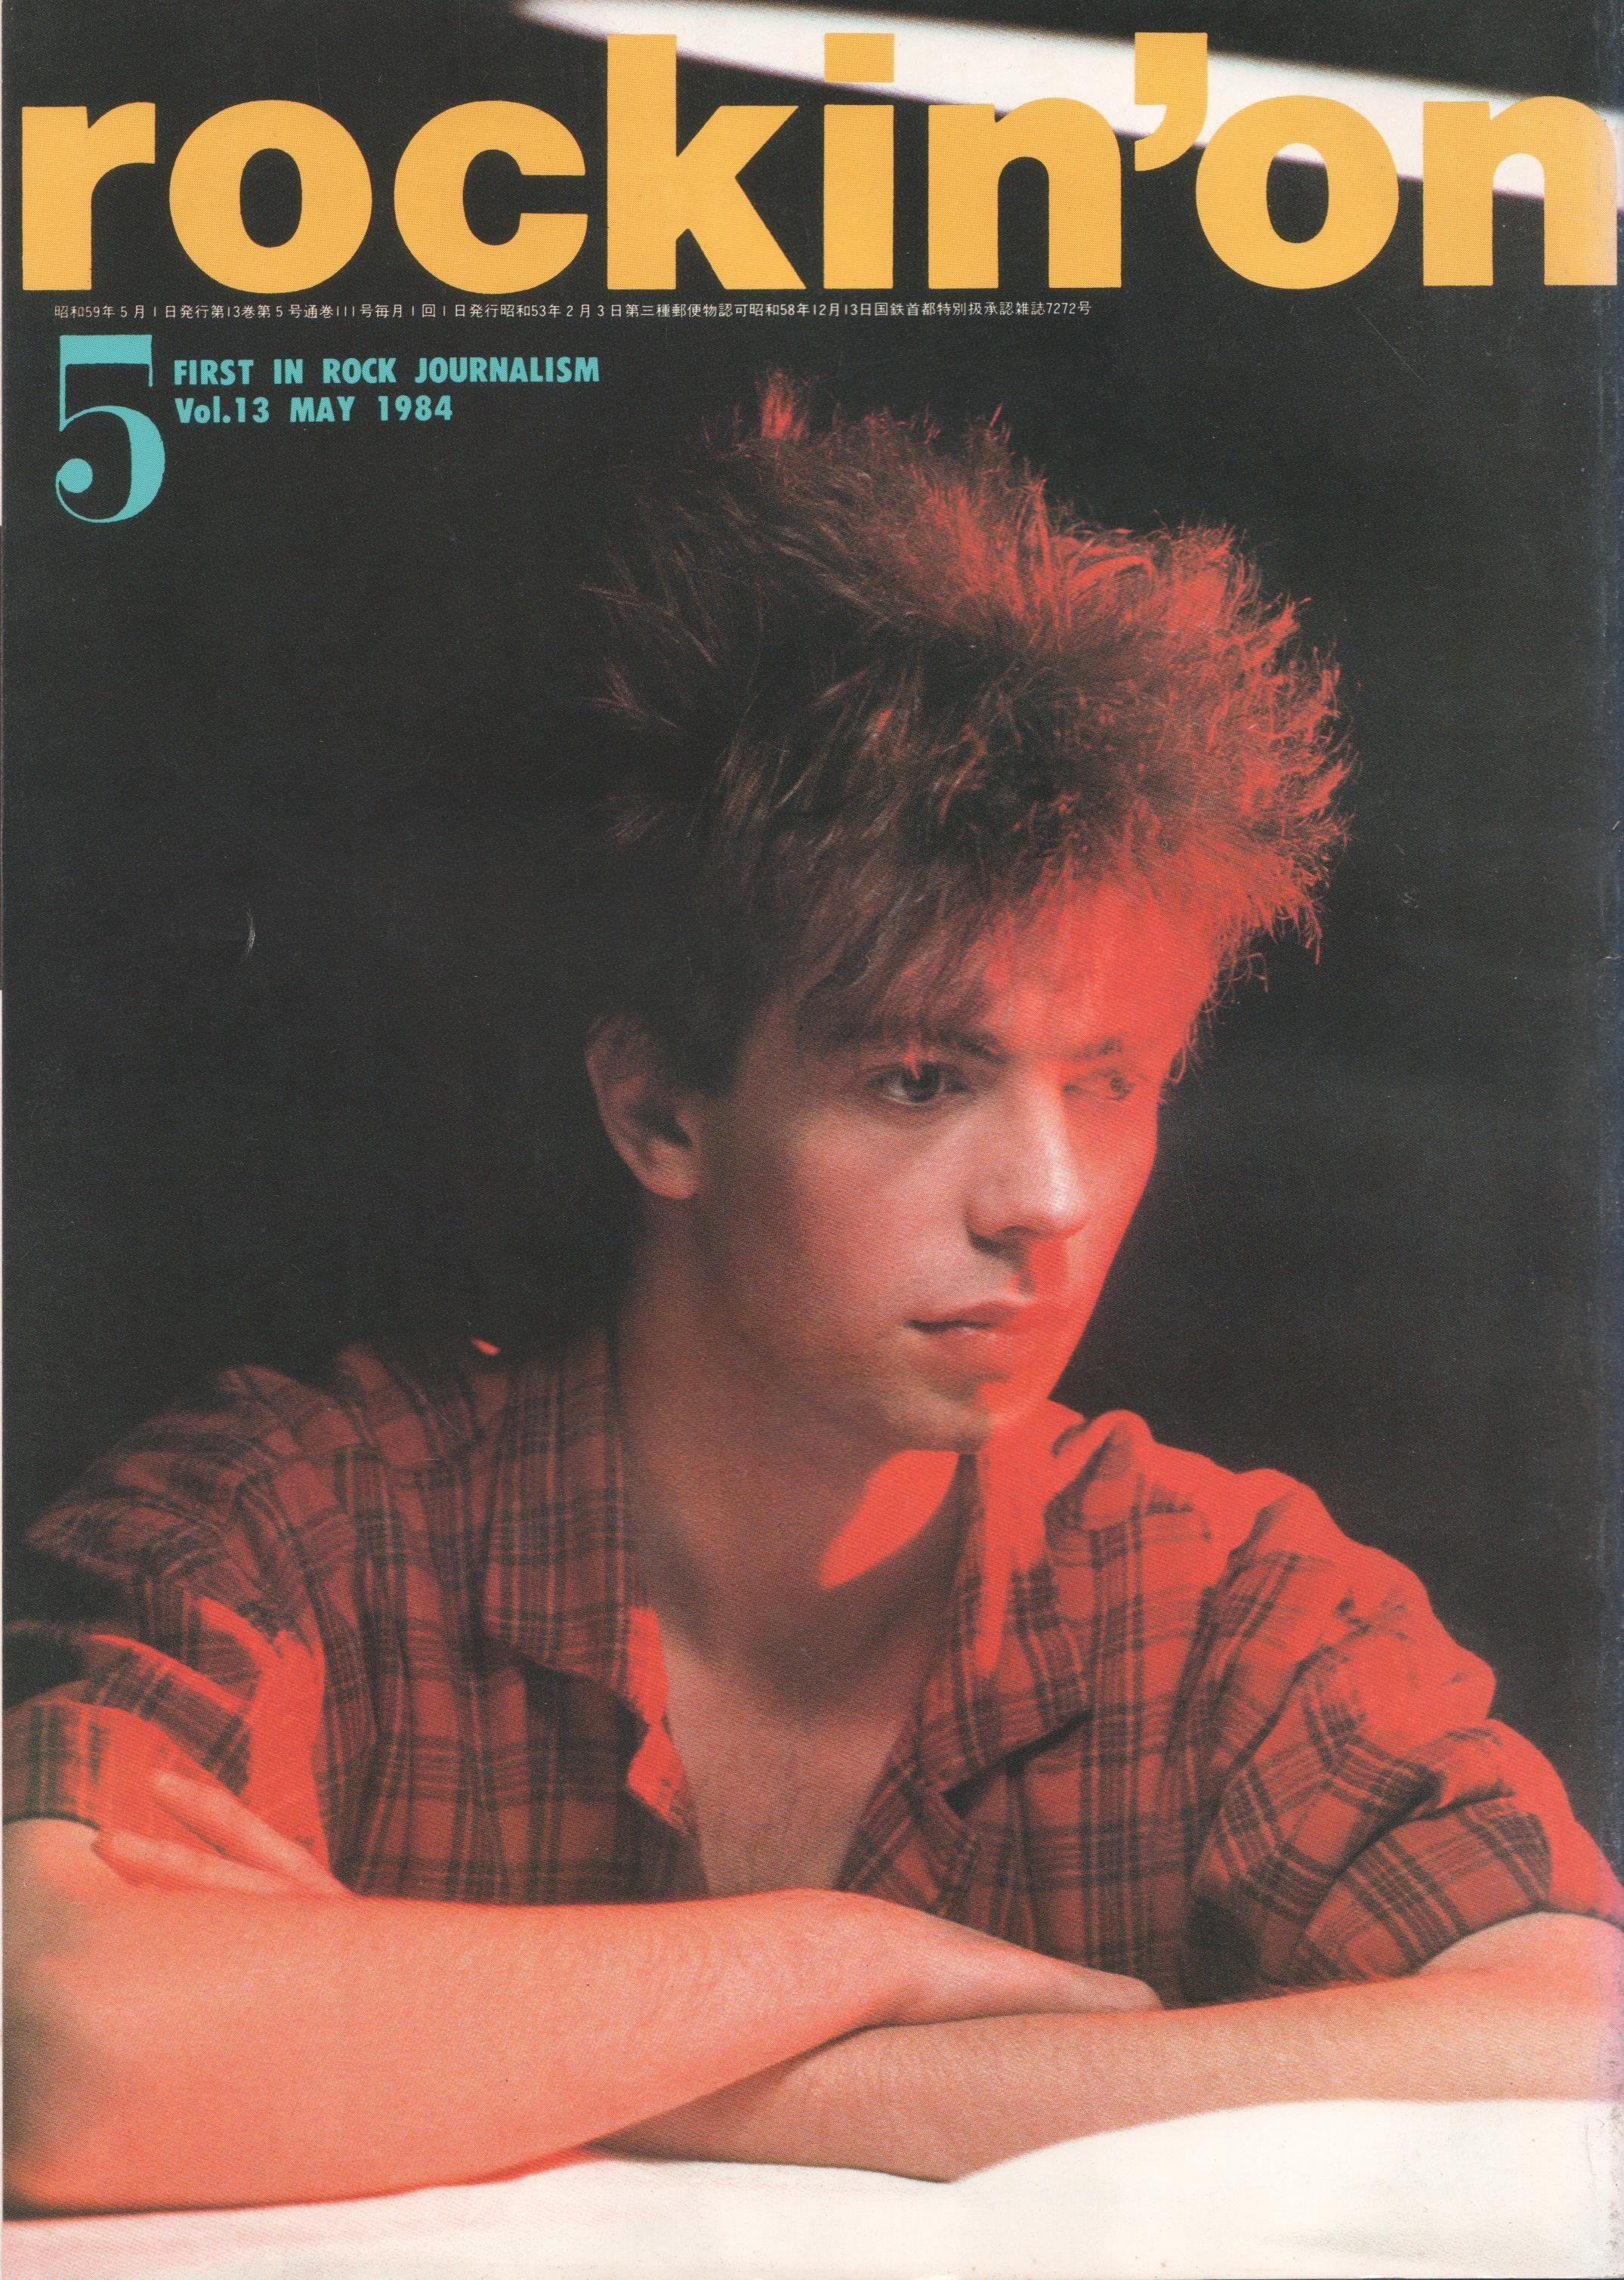 rockin'on ロッキング・オン 1984年5月号